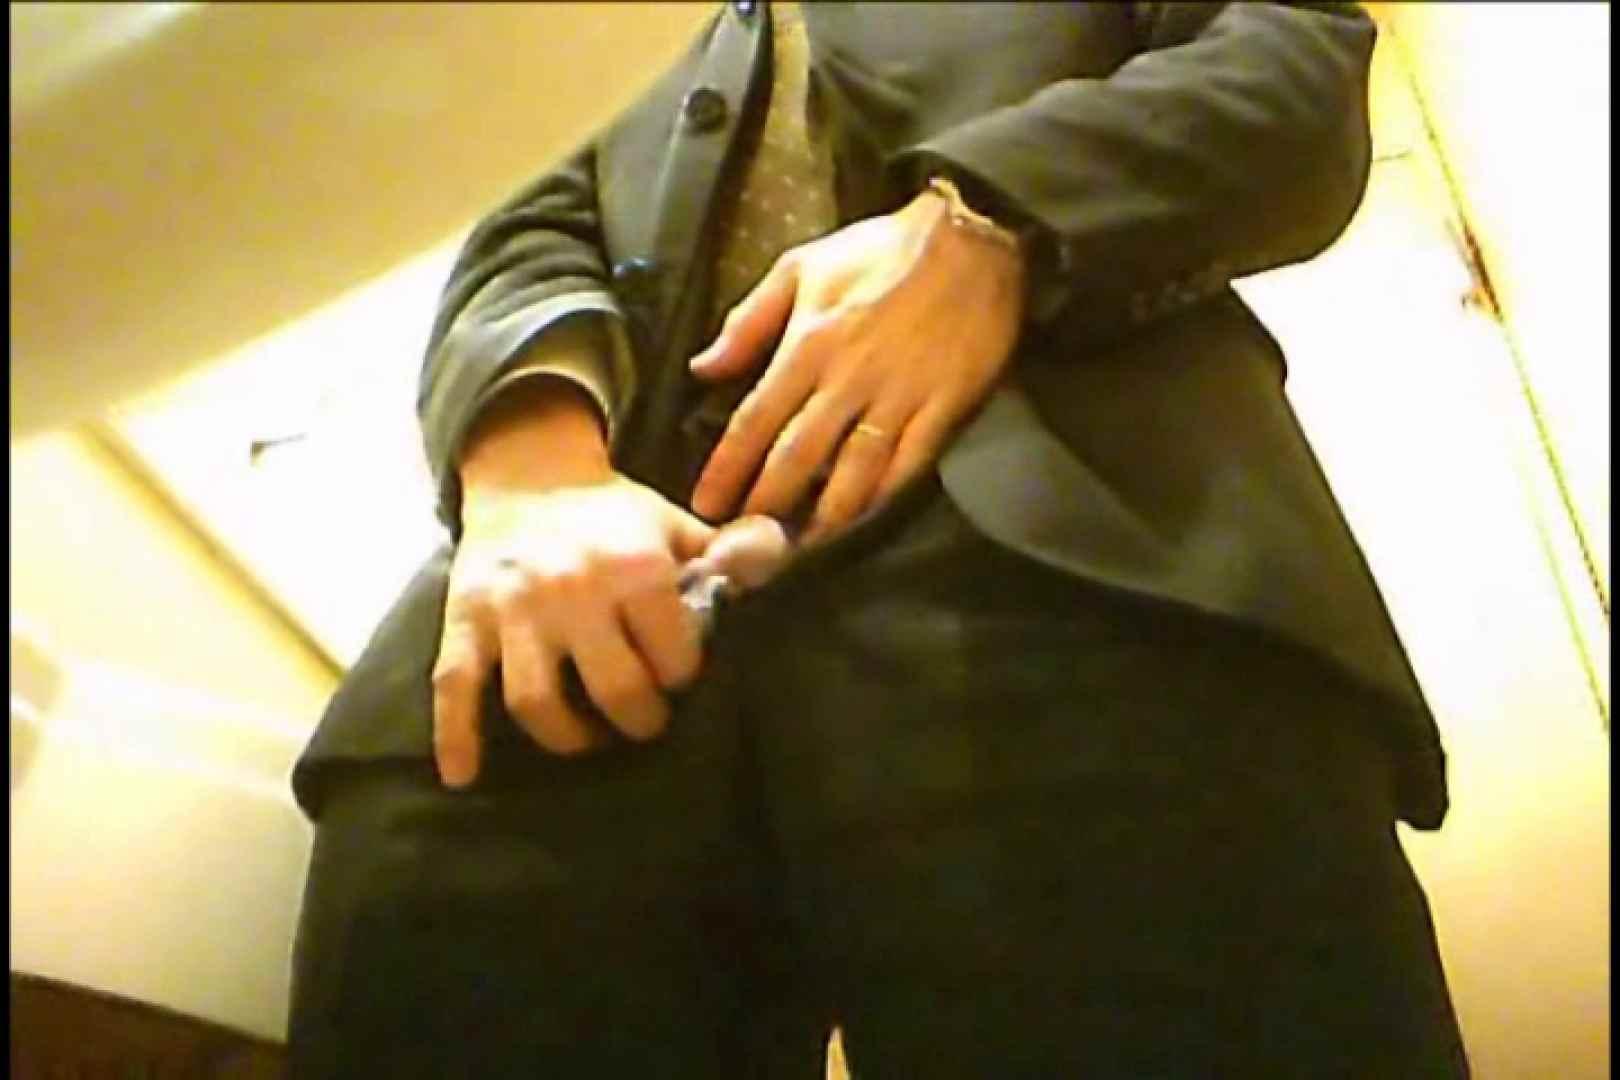 Gボーイ初投稿!掴み取りさんの洗面所覗き!in新幹線!VOL.01 スーツボーイズ | 男天国  103pic 11